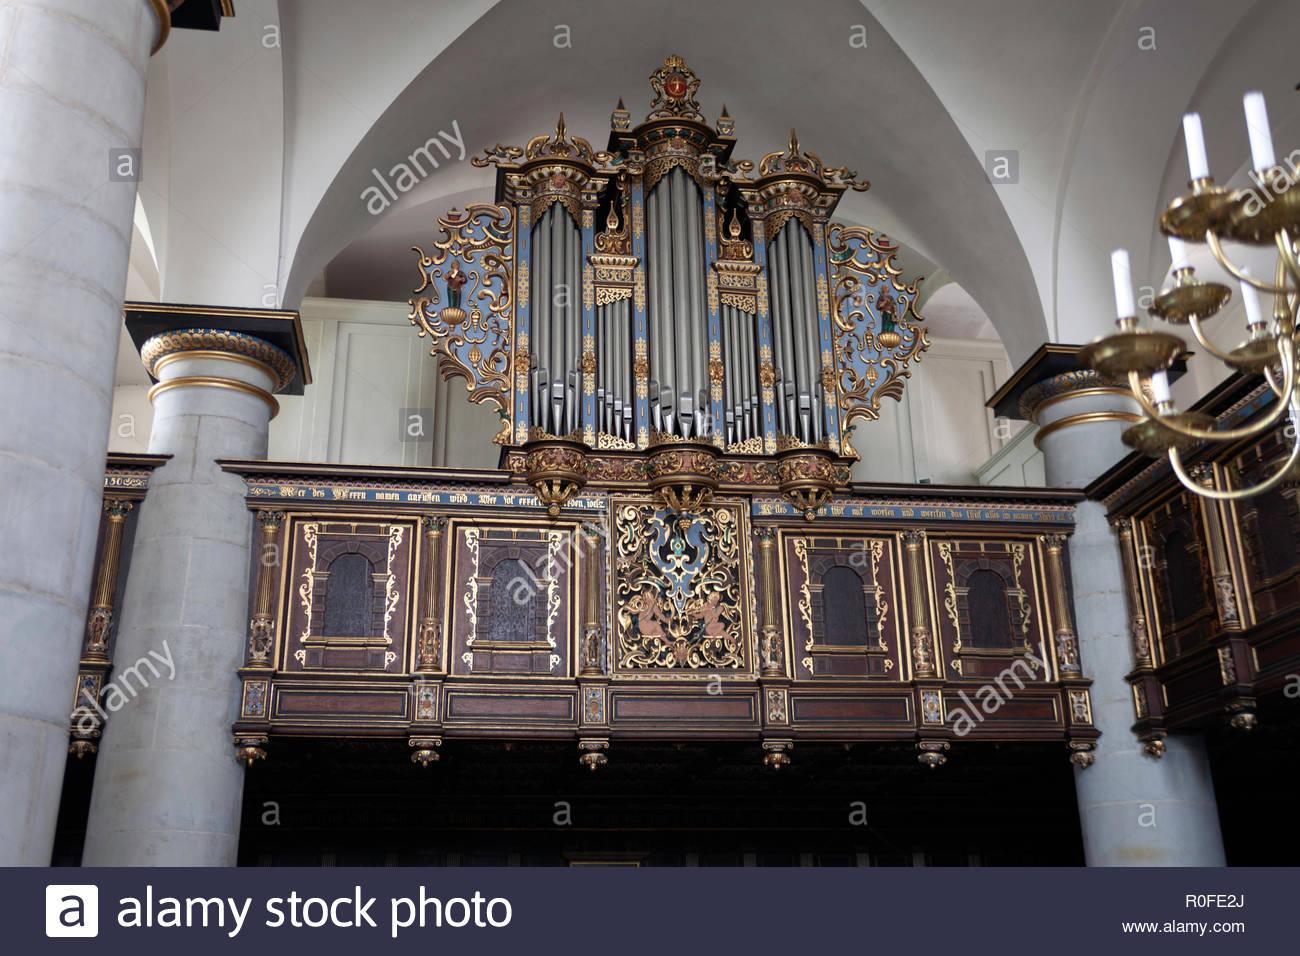 Pipe organ in Kronborg castle chapel - Stock Image